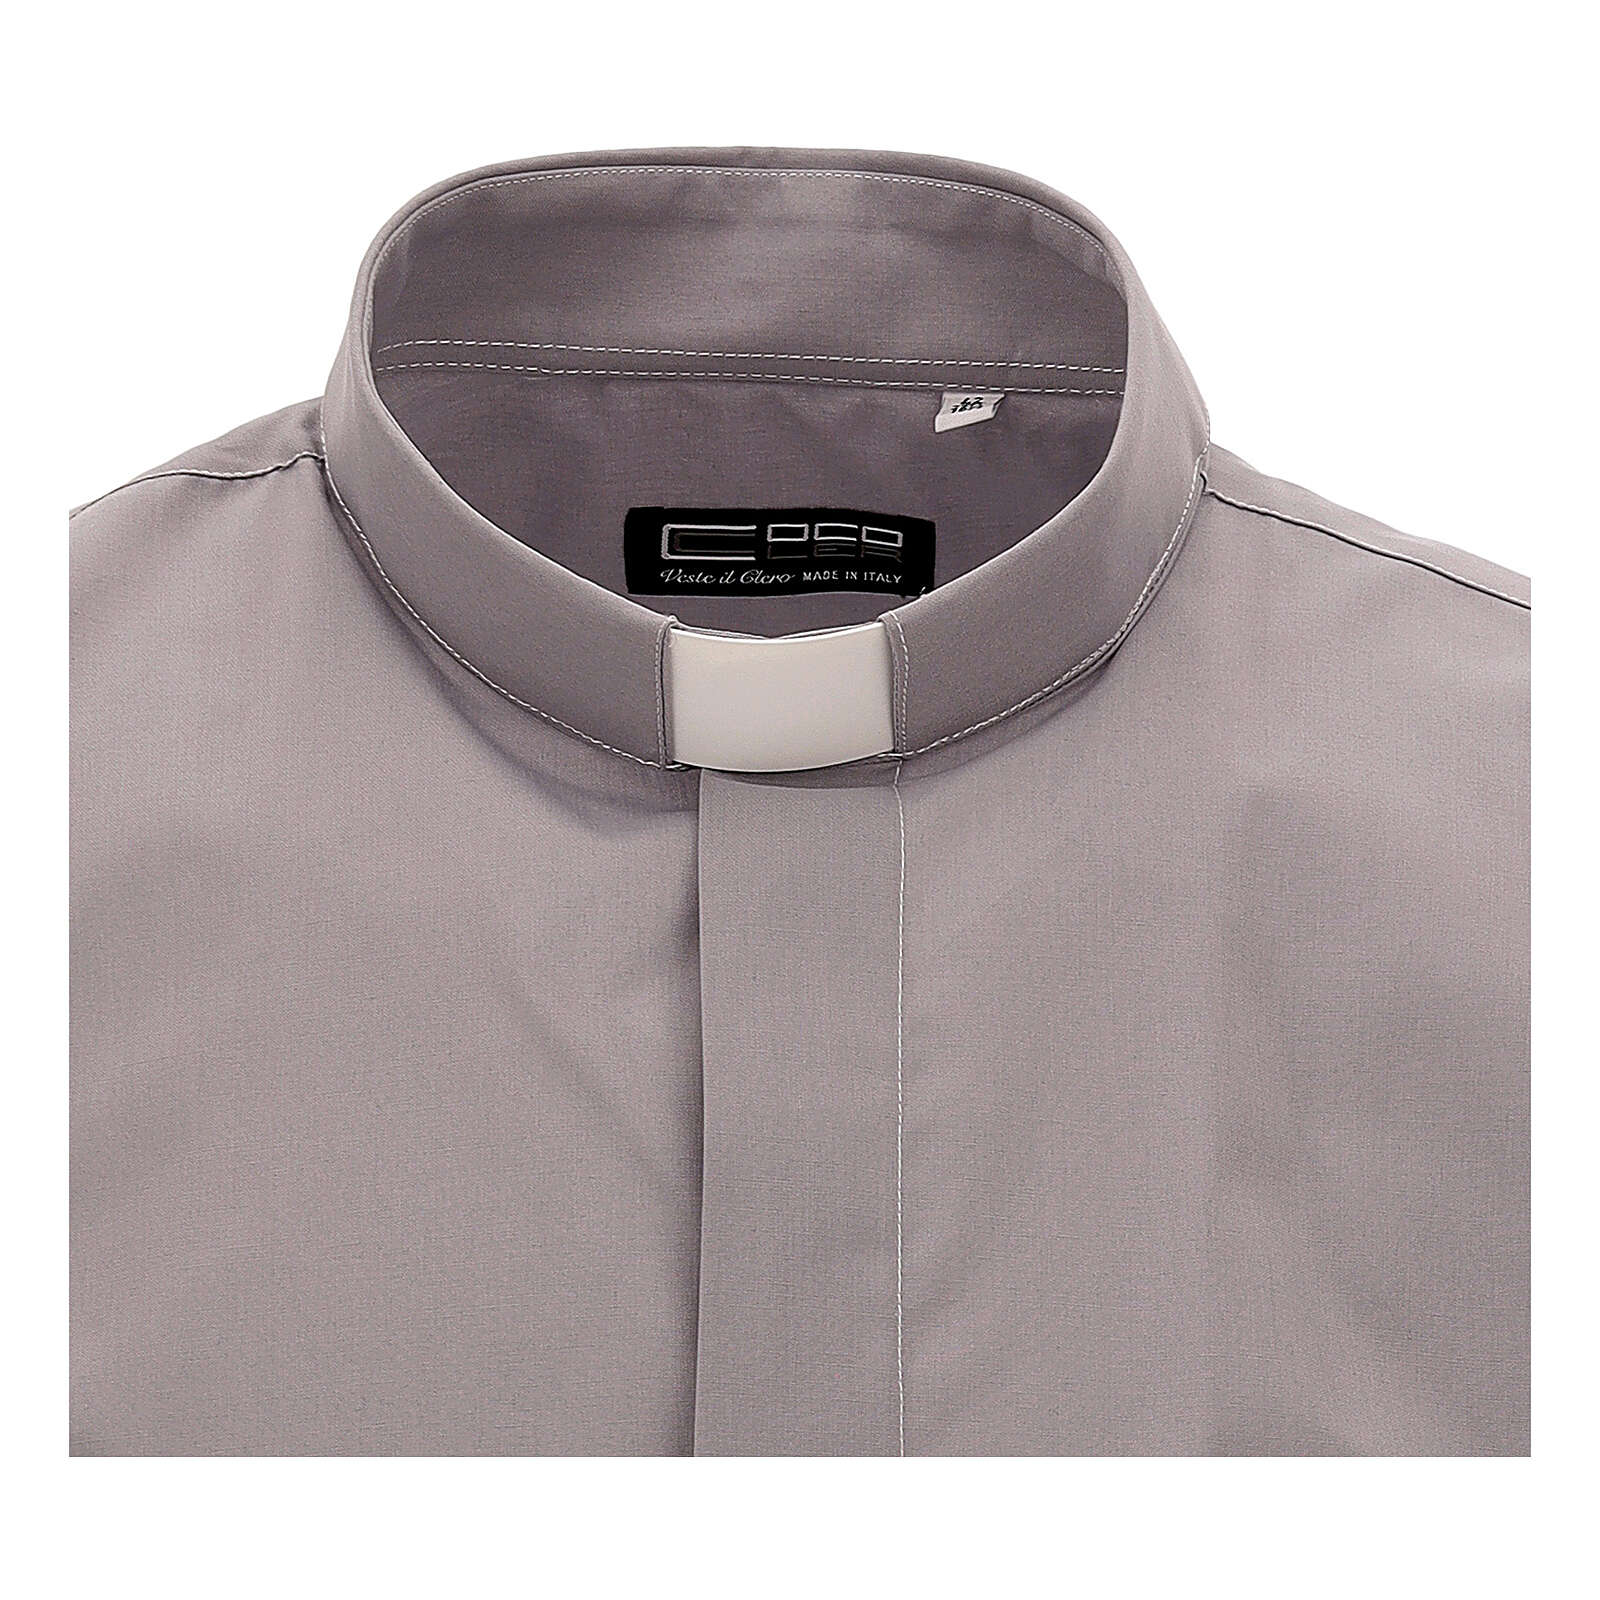 Camisa clergy gris claro de un solo color manga corta 4